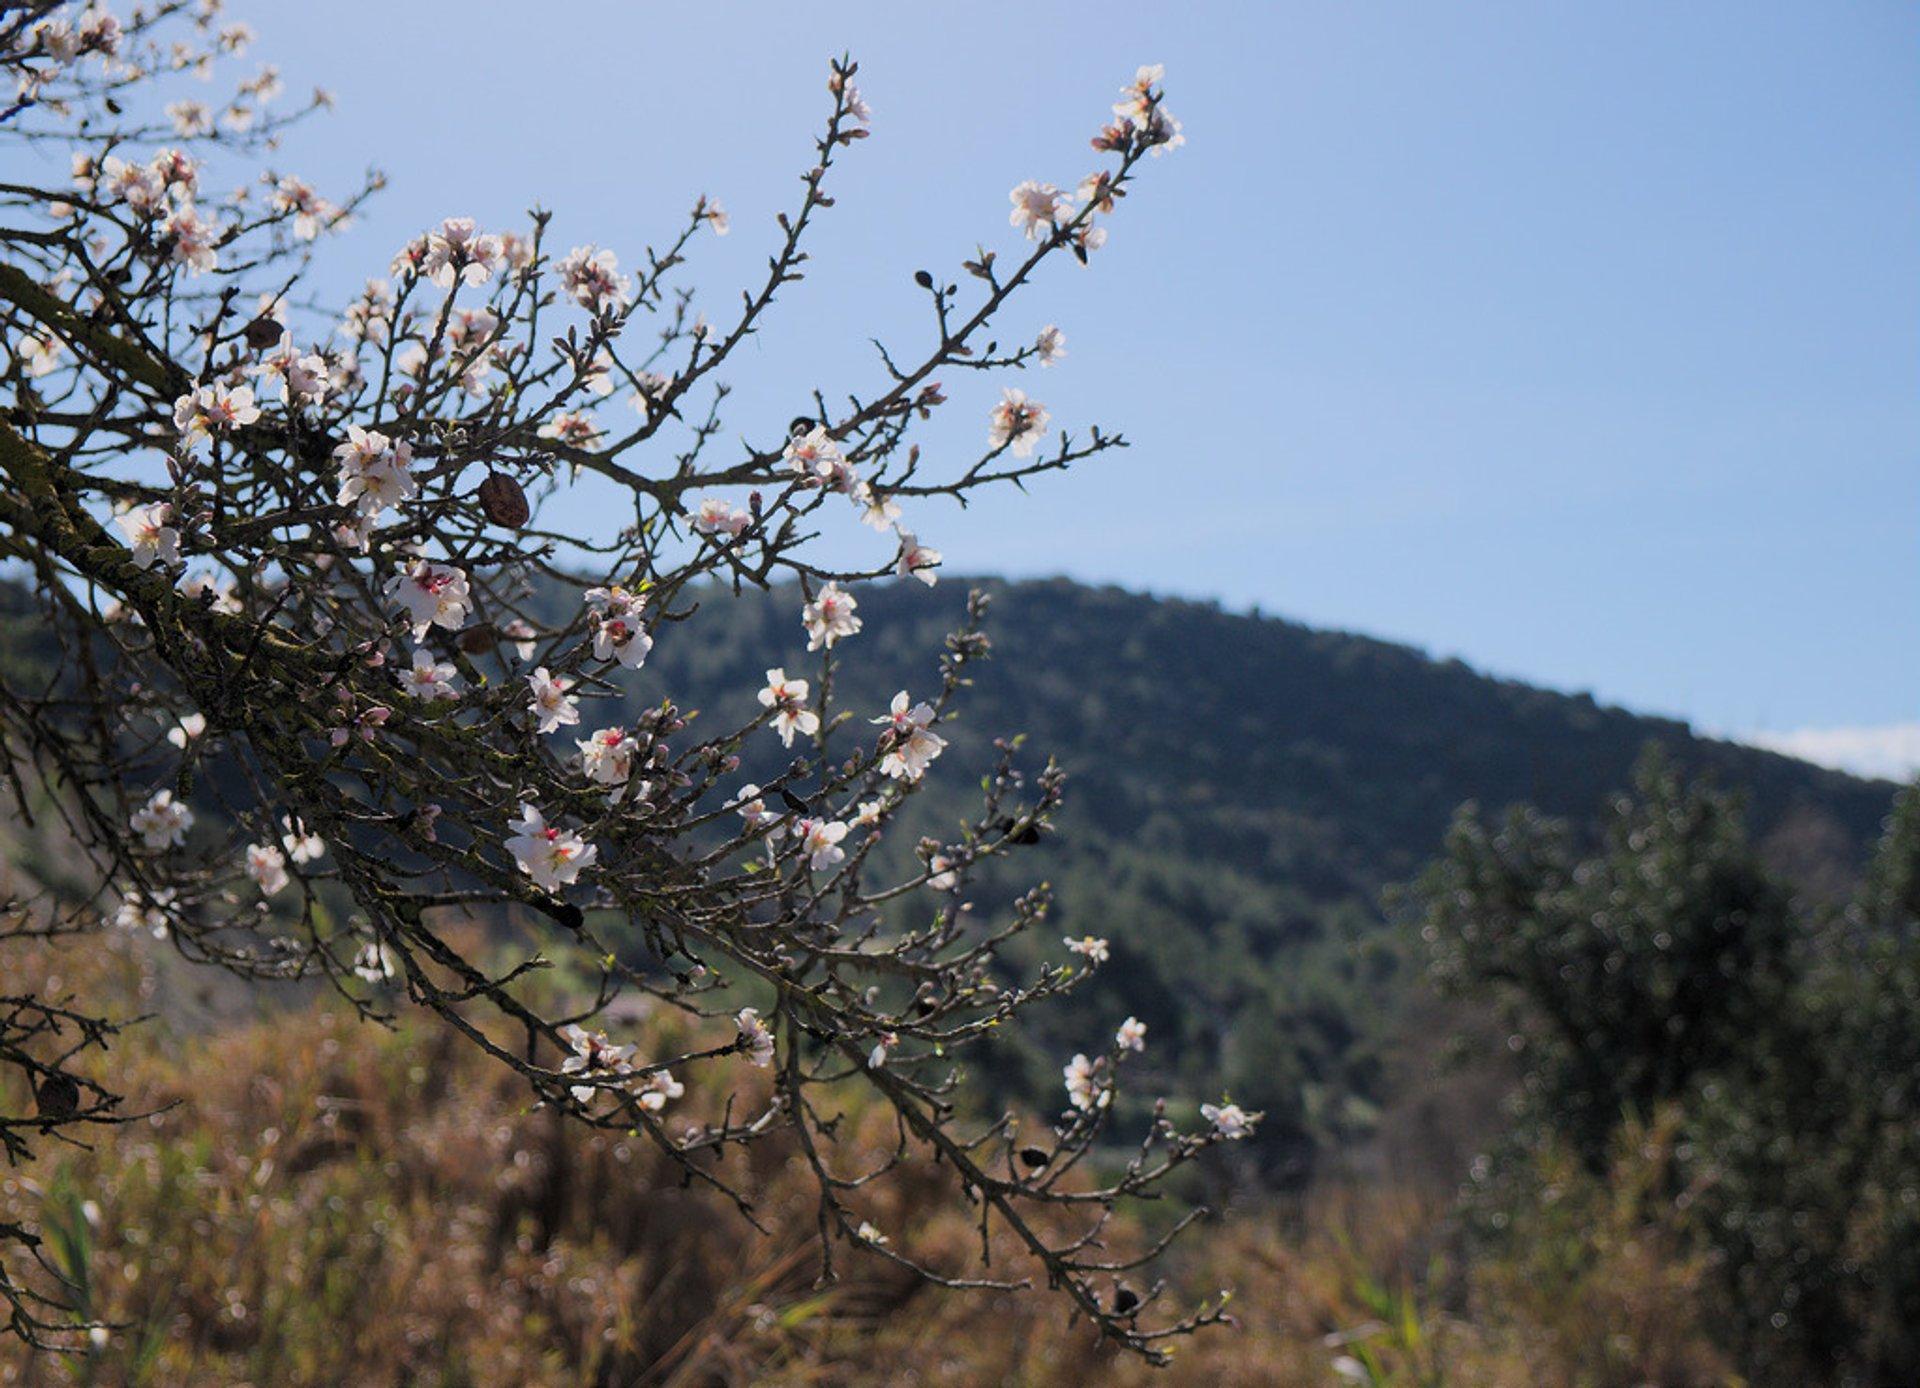 Almond bloom 2020